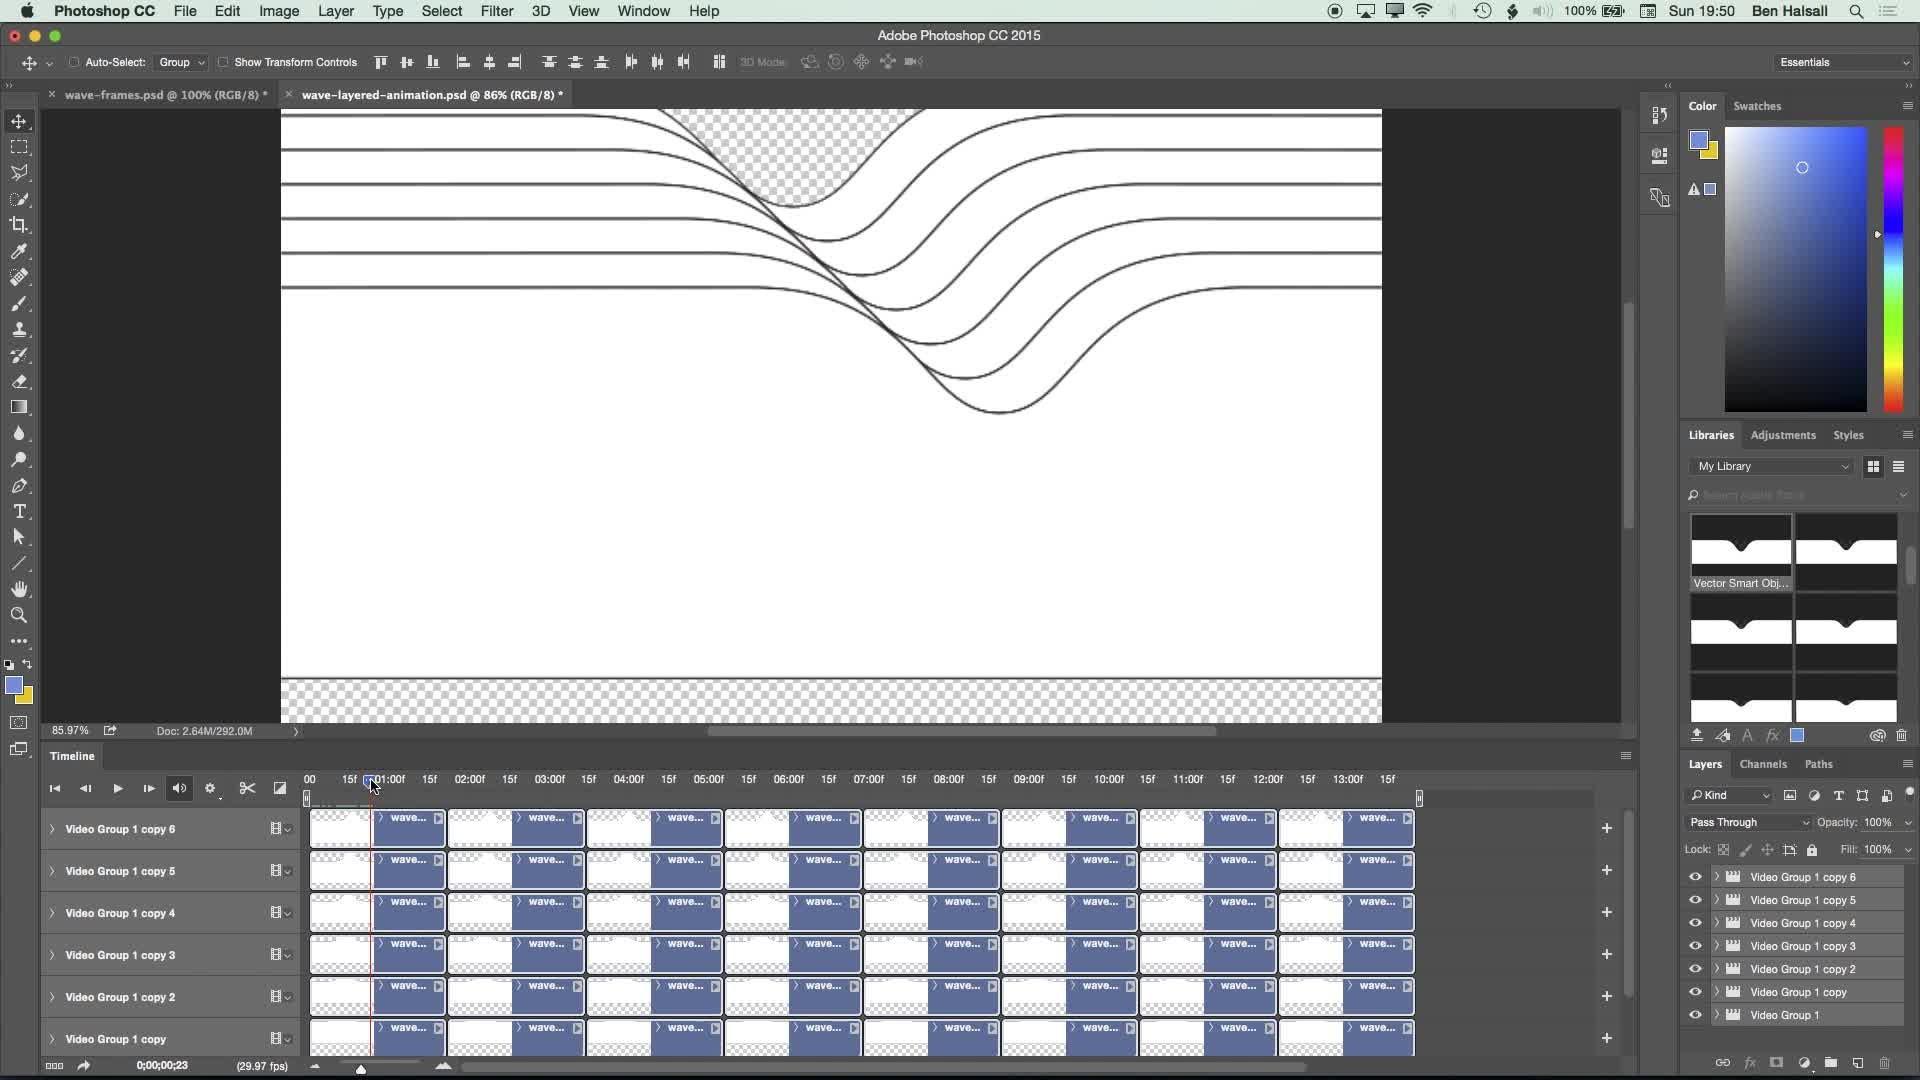 Illustrator & Photoshop: Create a Looping Wave Animation